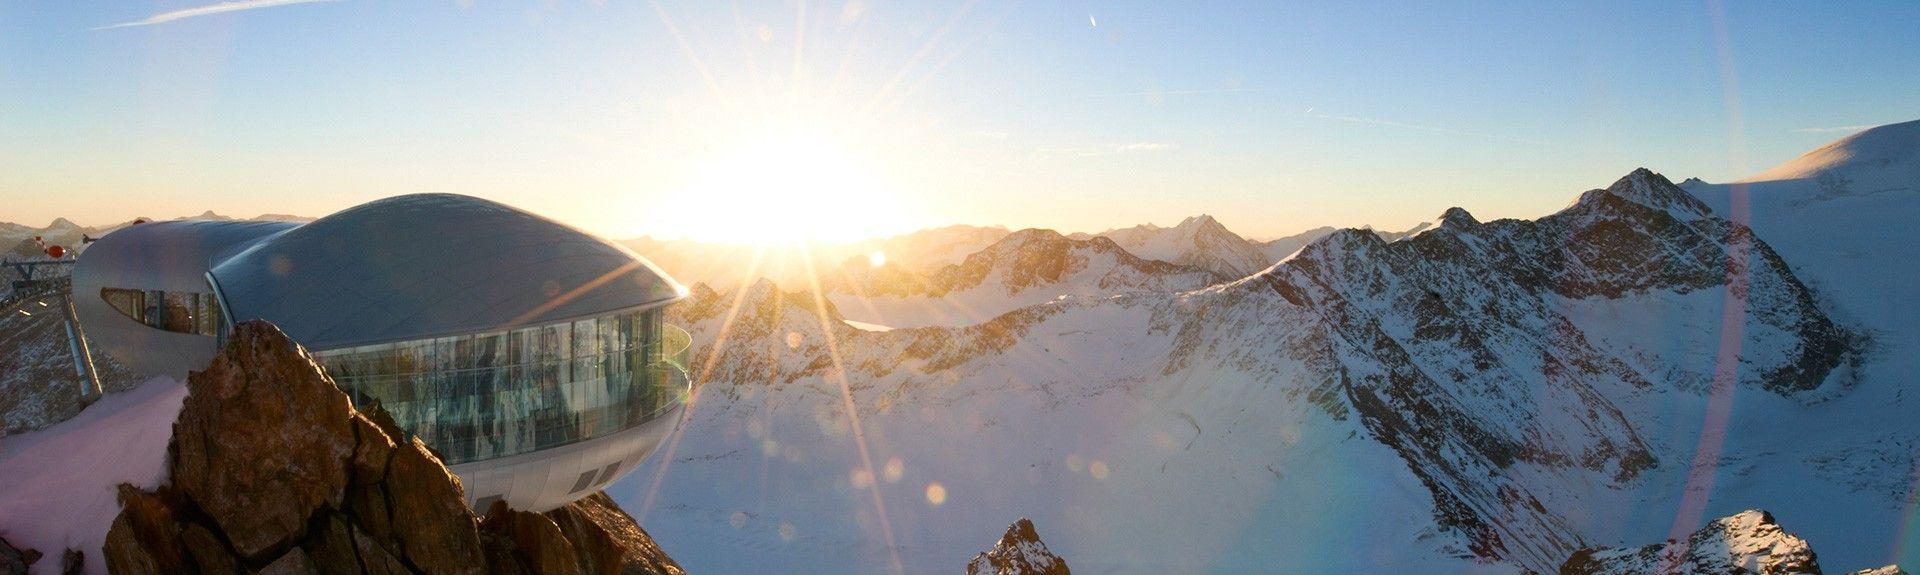 Oetz, Tyrol, Áustria